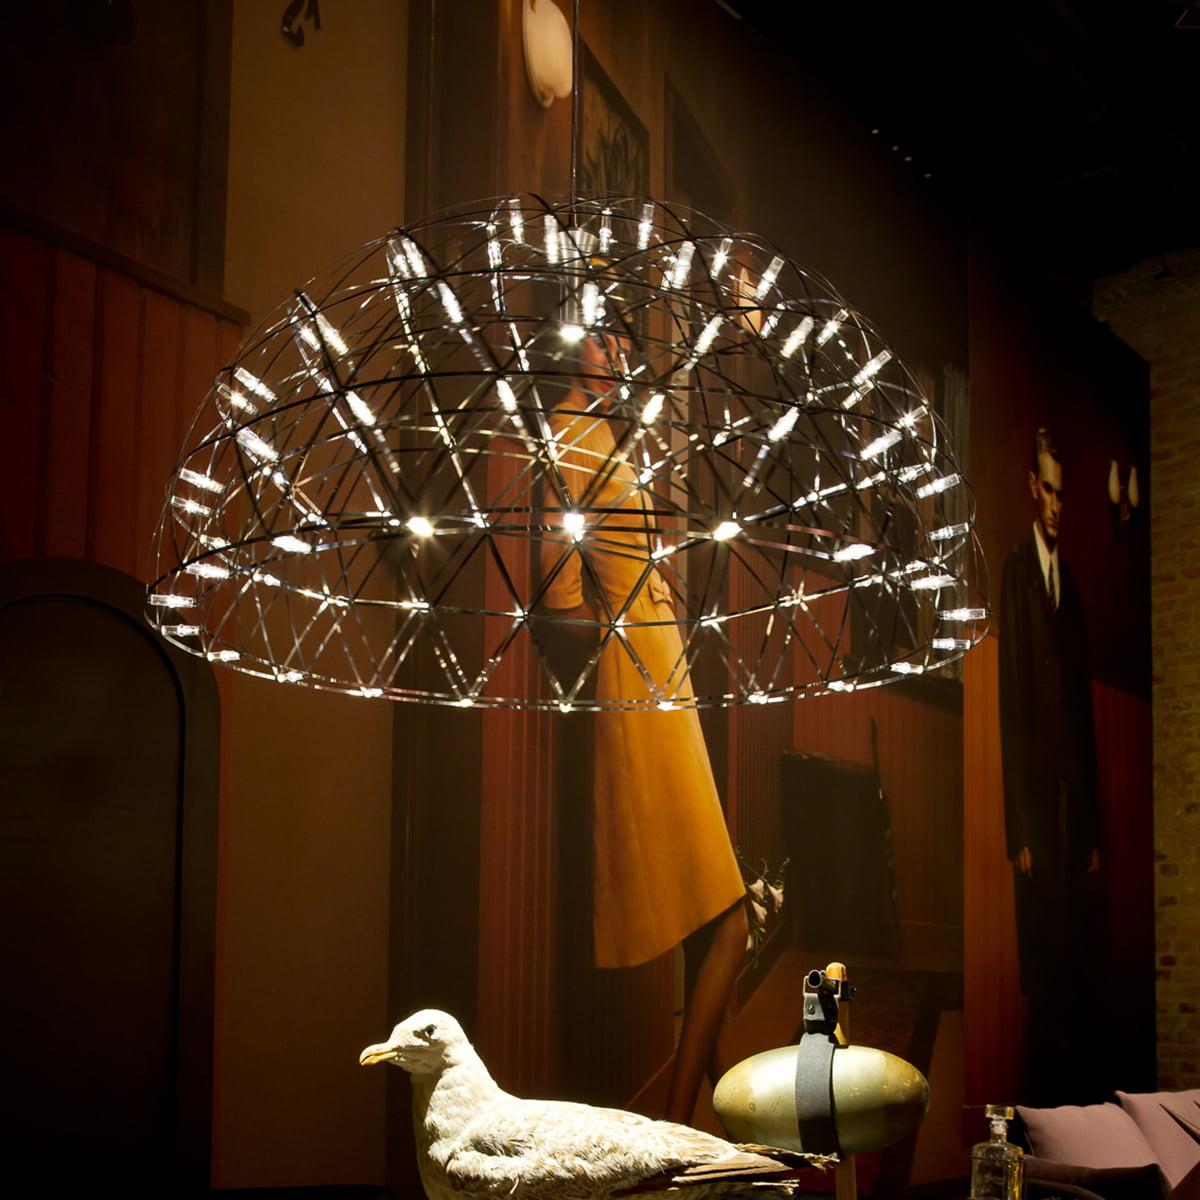 Raimond Dome 79 pendant lamp by Moooi for Moooi Raimond Dome  199fiz